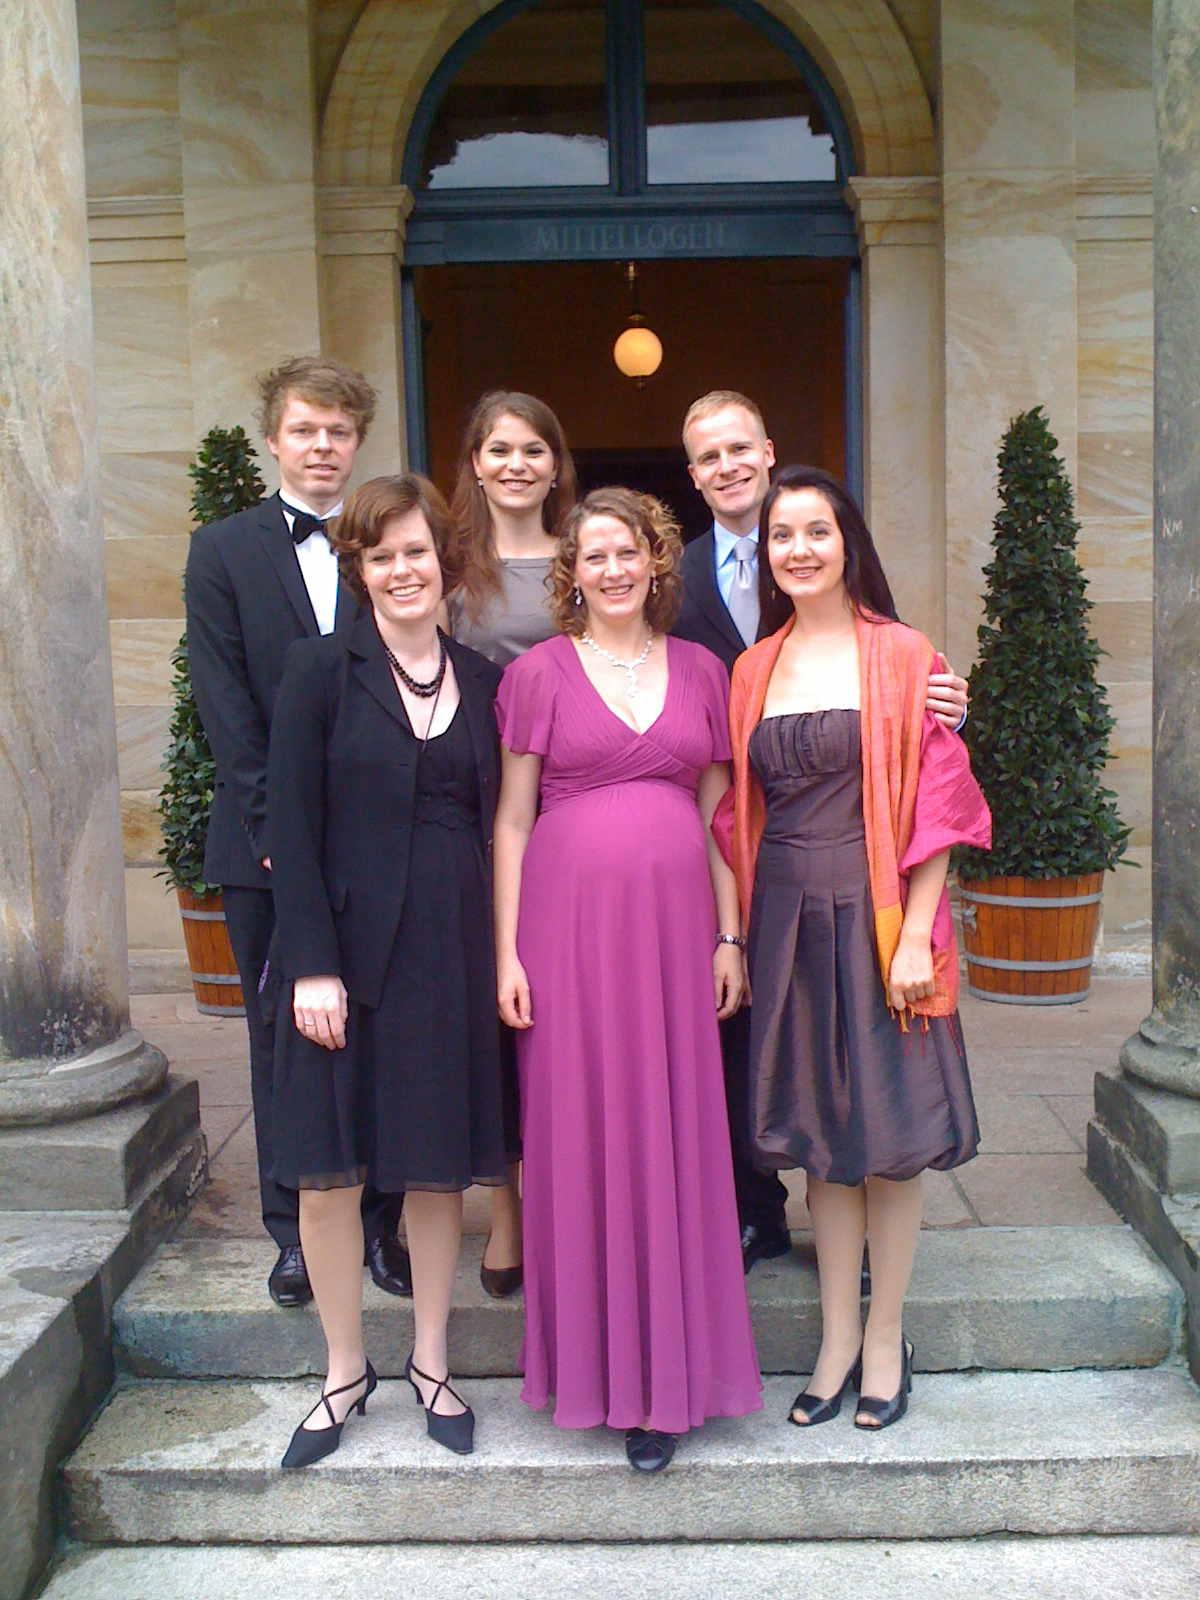 Von links nach rechts: Stefan Koim, Christina Desalm, Cordelia Katharina Weil, Hiltrud Kuhlmann, Dr. Ulrich Wilker, Csilla Csövári